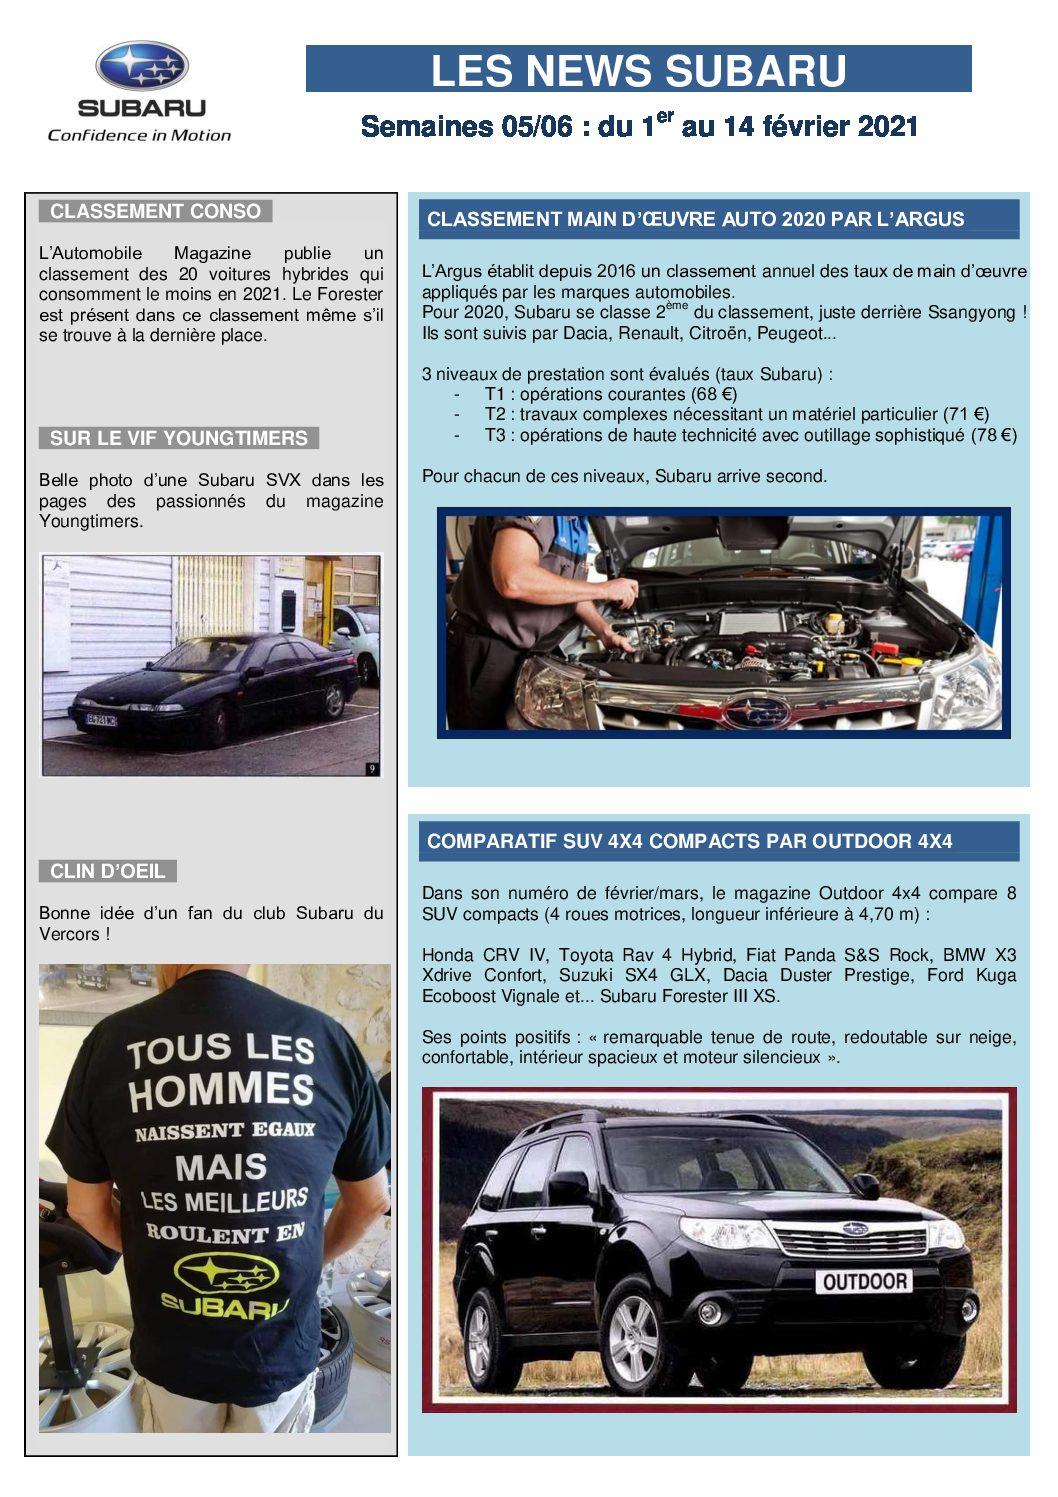 Les News Subaru – Février 2021